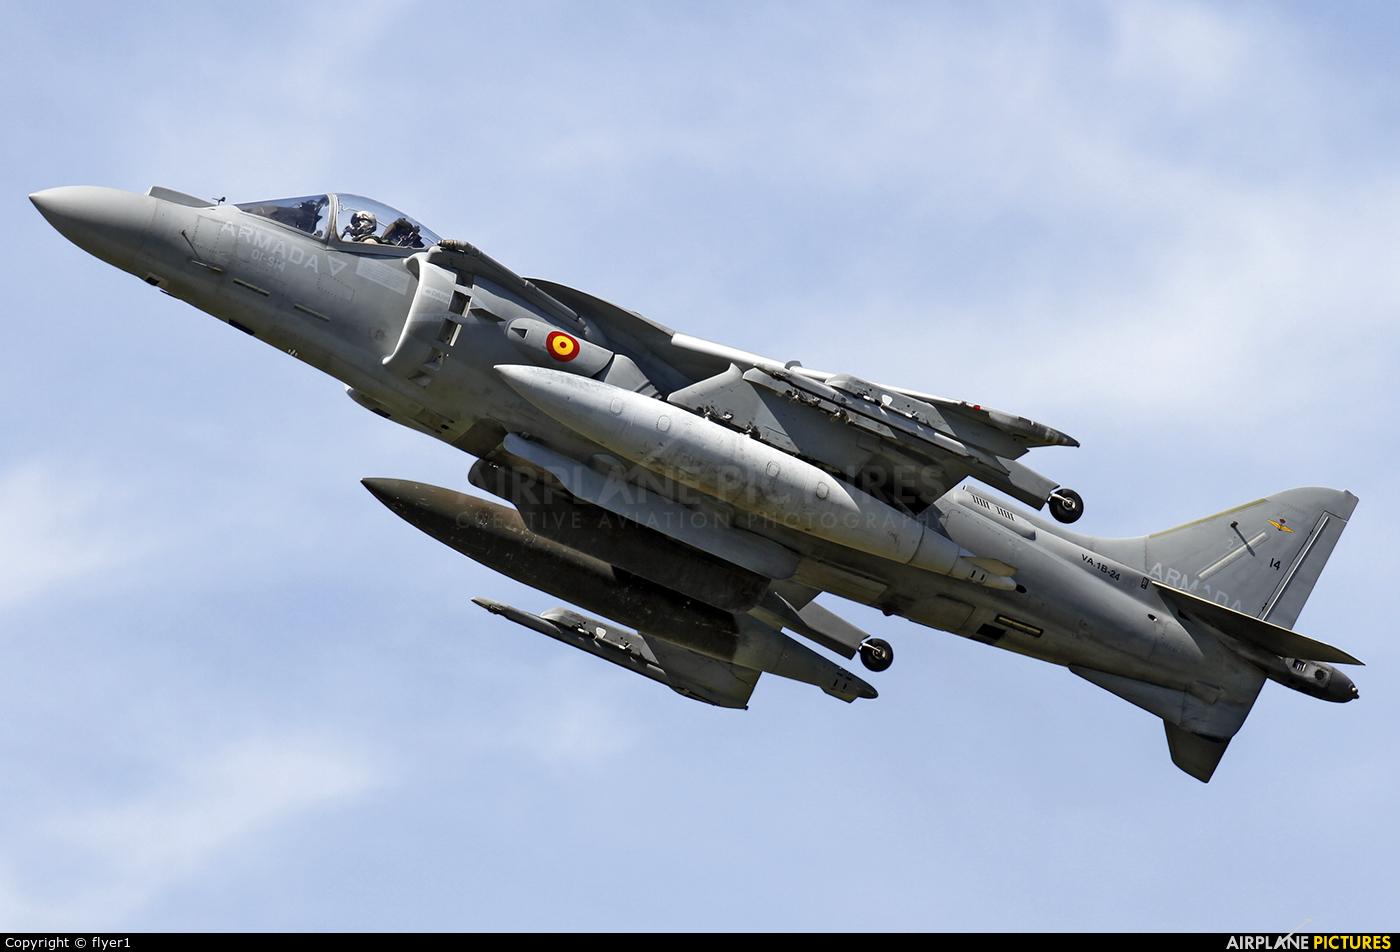 Spain - Navy VA.1B-24 aircraft at Farnborough